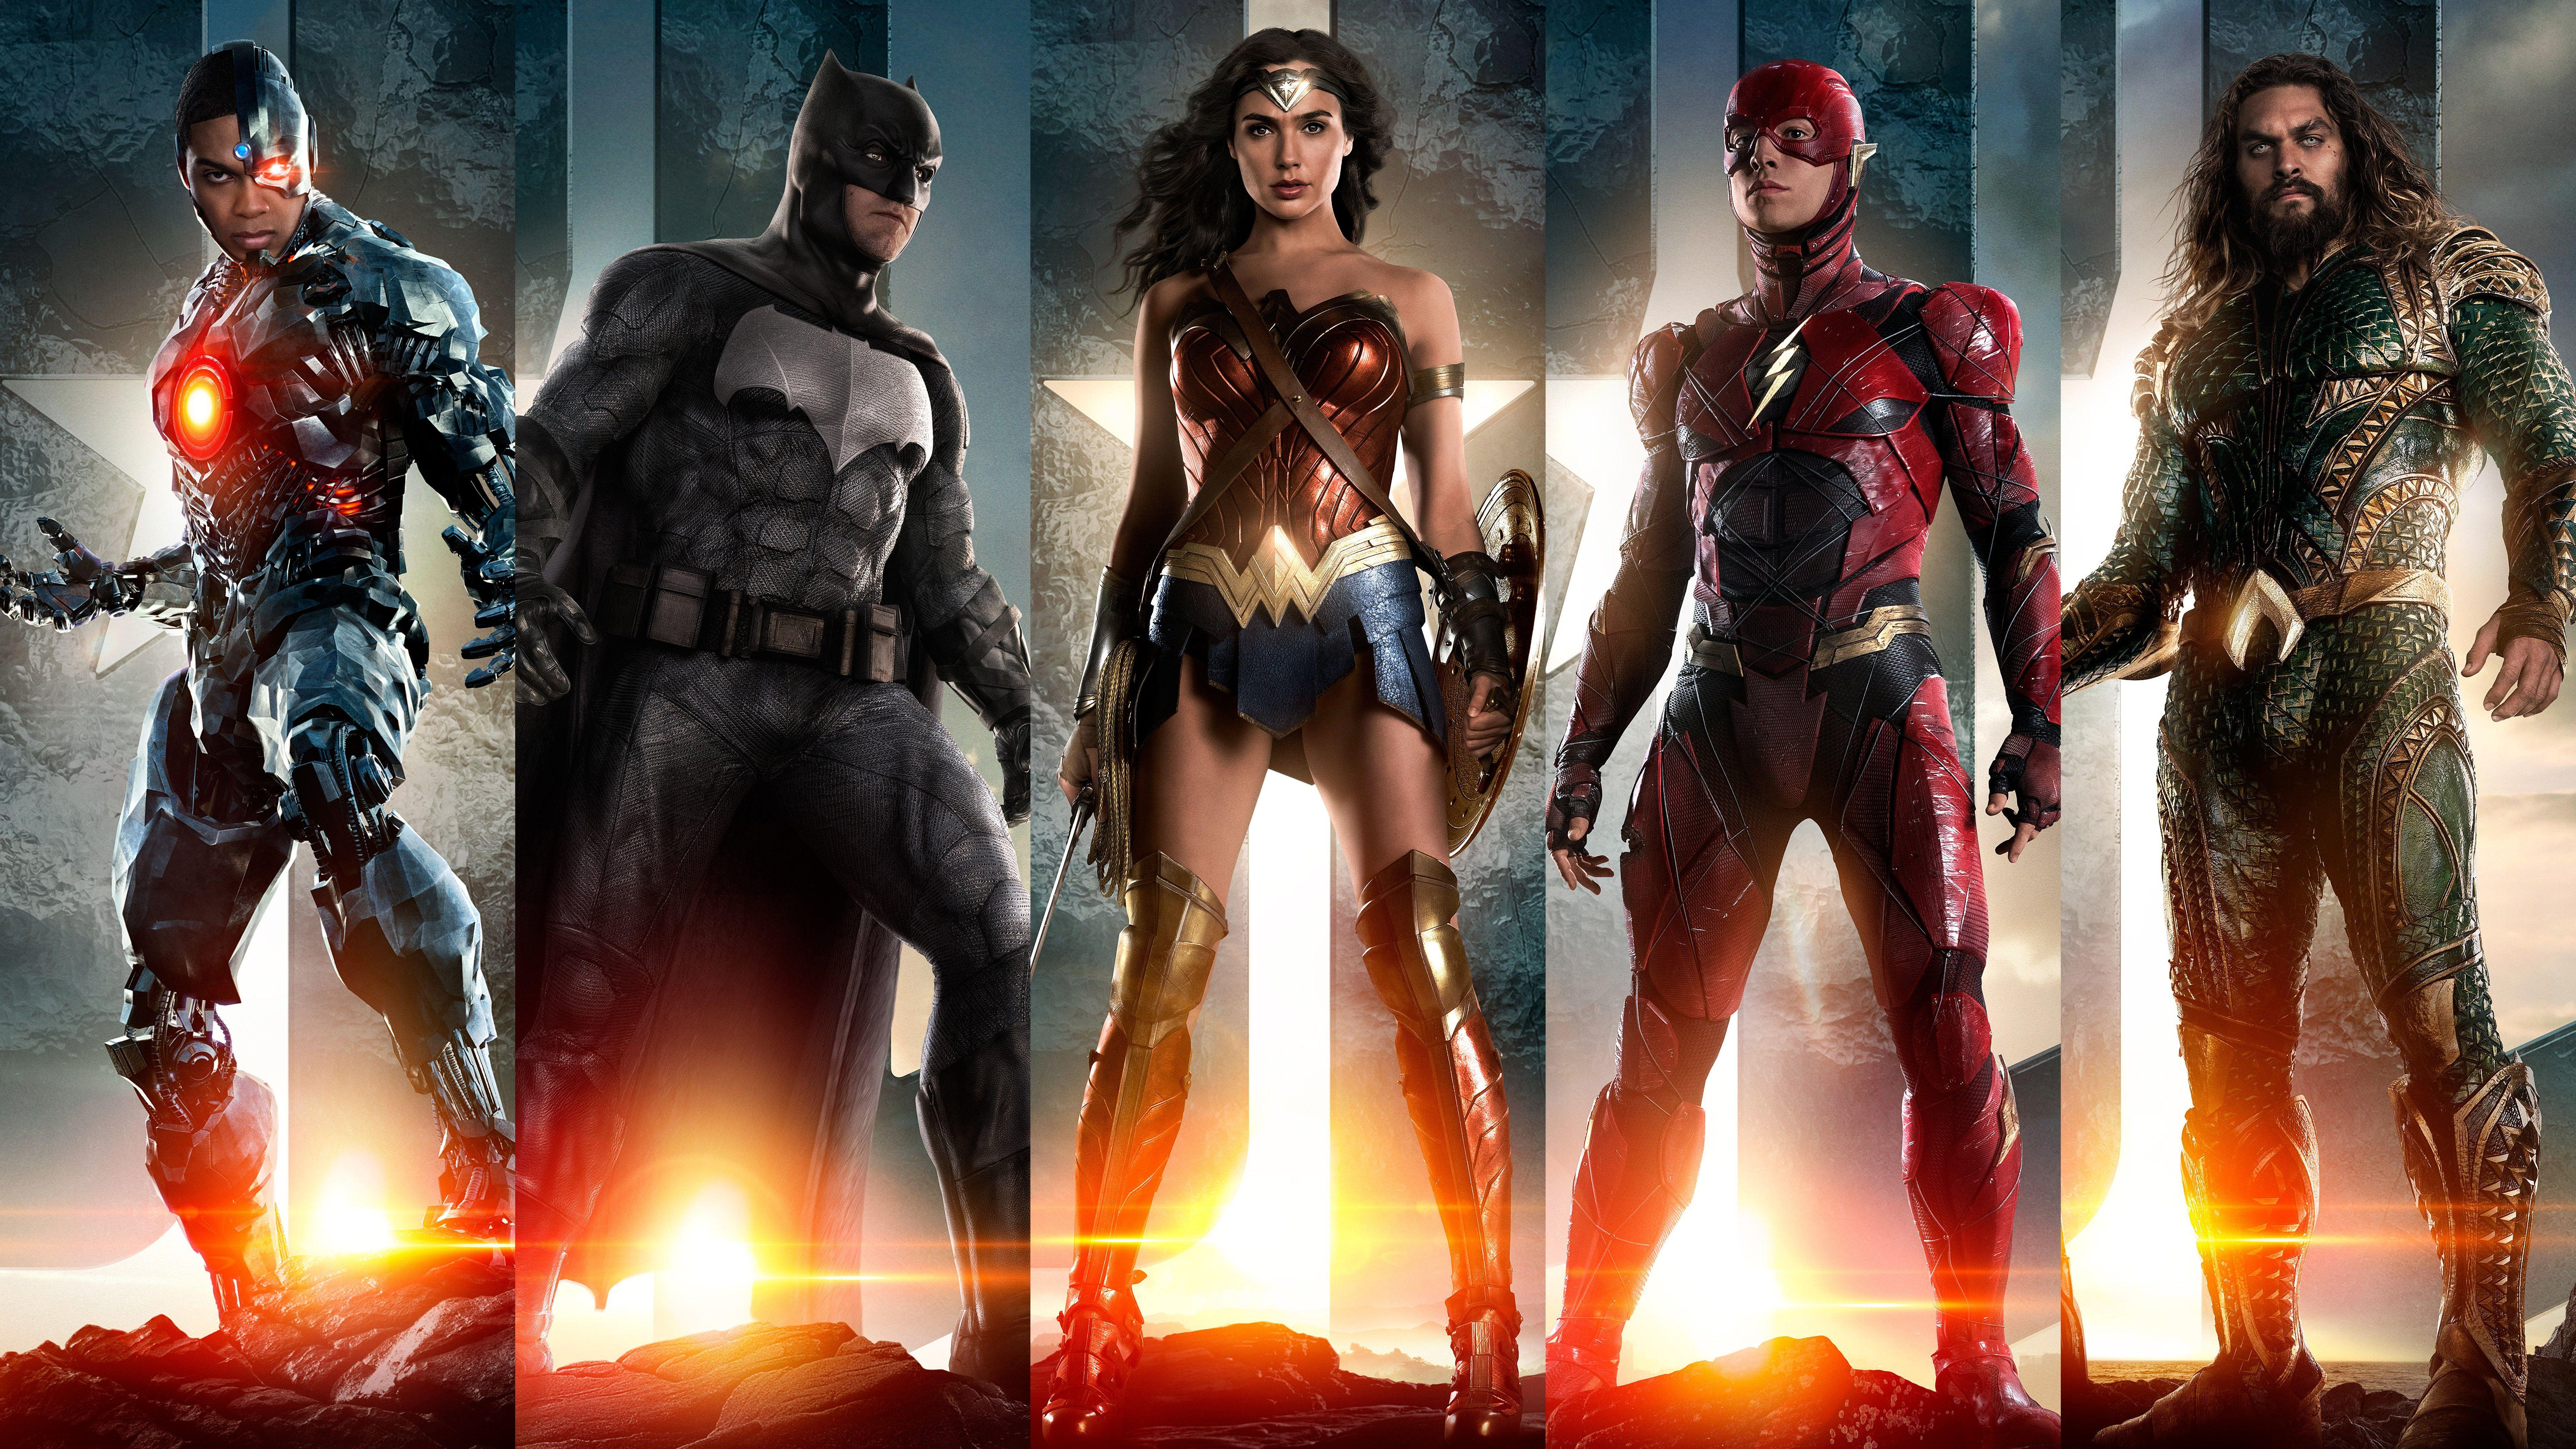 Wallpaper Justice League 2017 Movies Flash Superman: Justice League 2017 Wallpapers